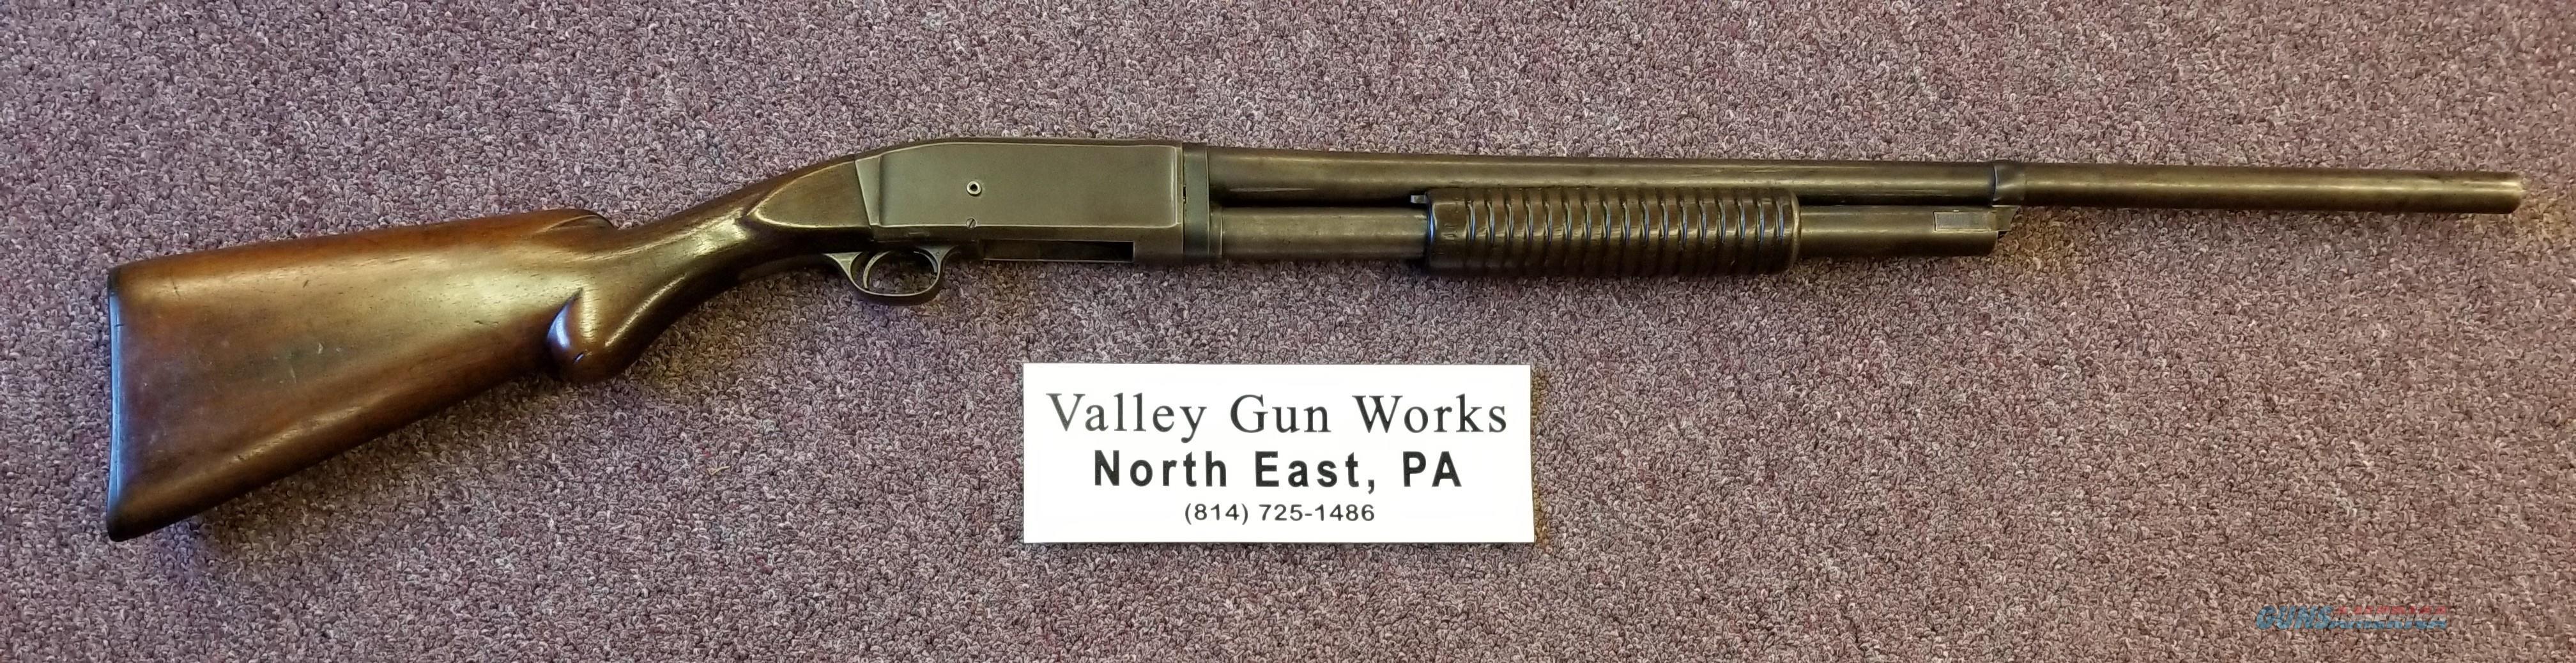 Remington 10A - 12 Gauge Pump - Extra Barrel - Free Shipping  Guns > Shotguns > Remington Shotguns  > Pump > Hunting